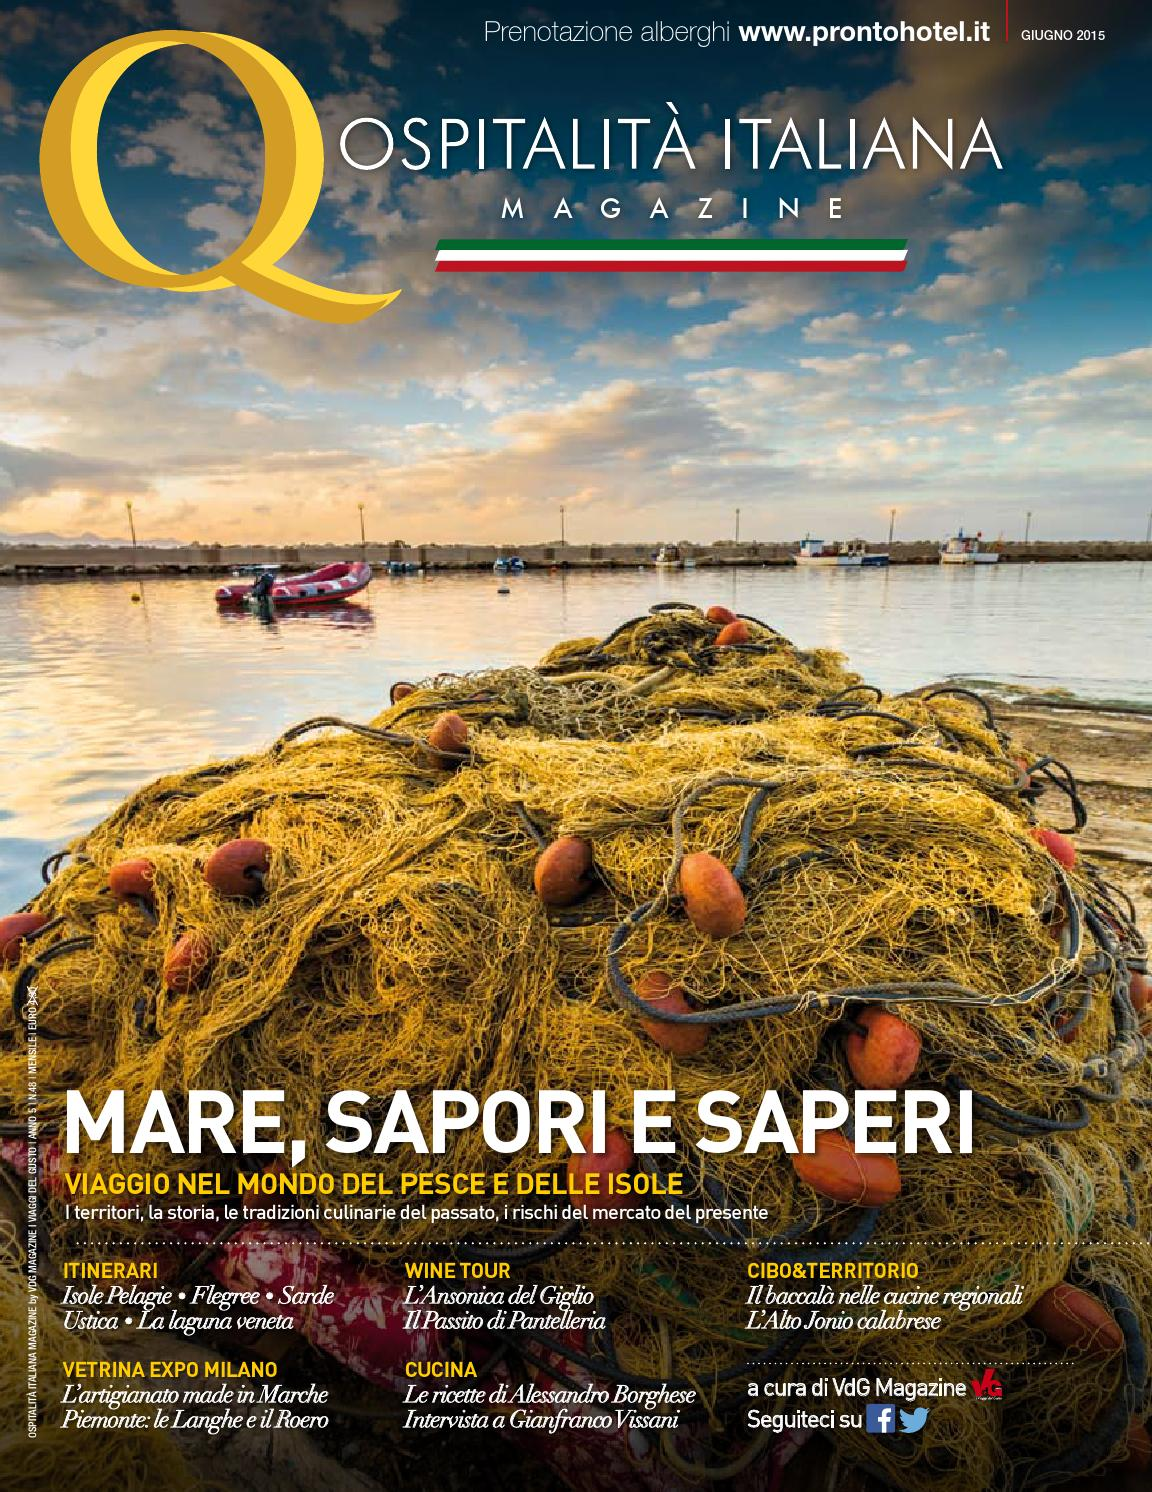 Ospitalità italiana giugno 2015 by vdgmagazine - issuu 4ec29faa3f31